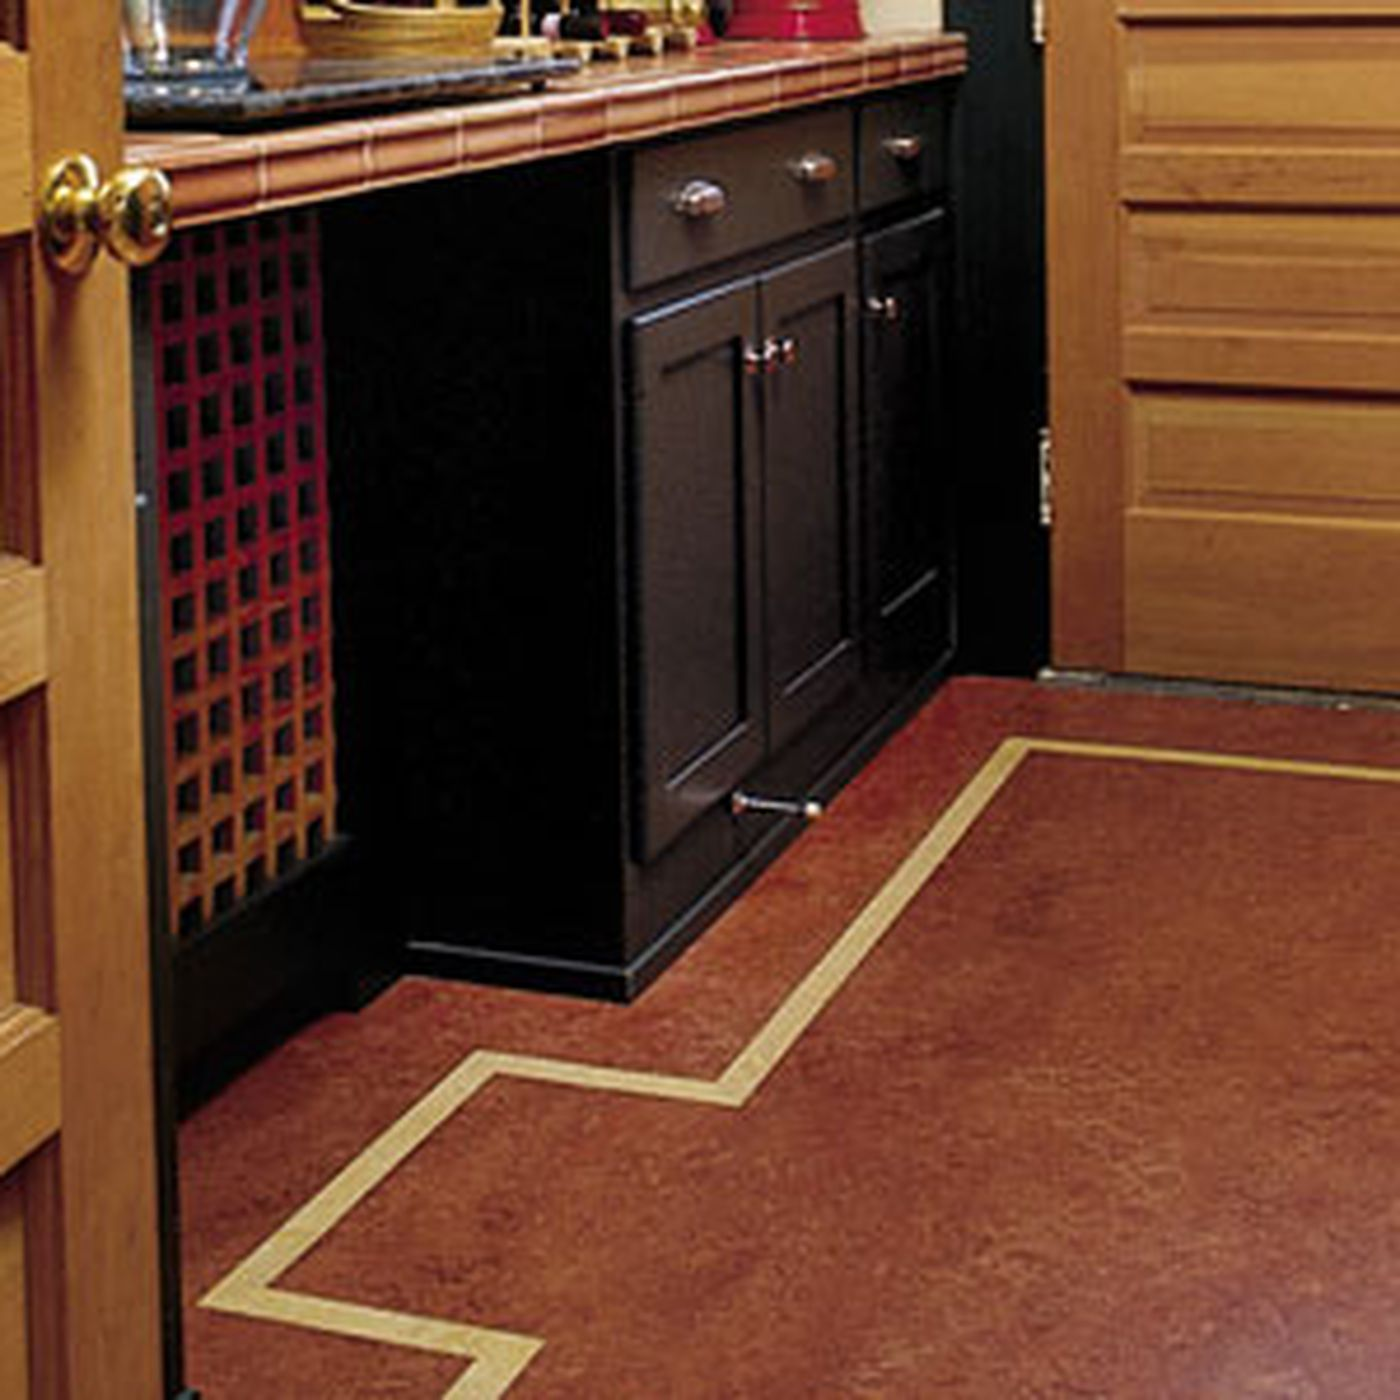 working with linoleum flooring this